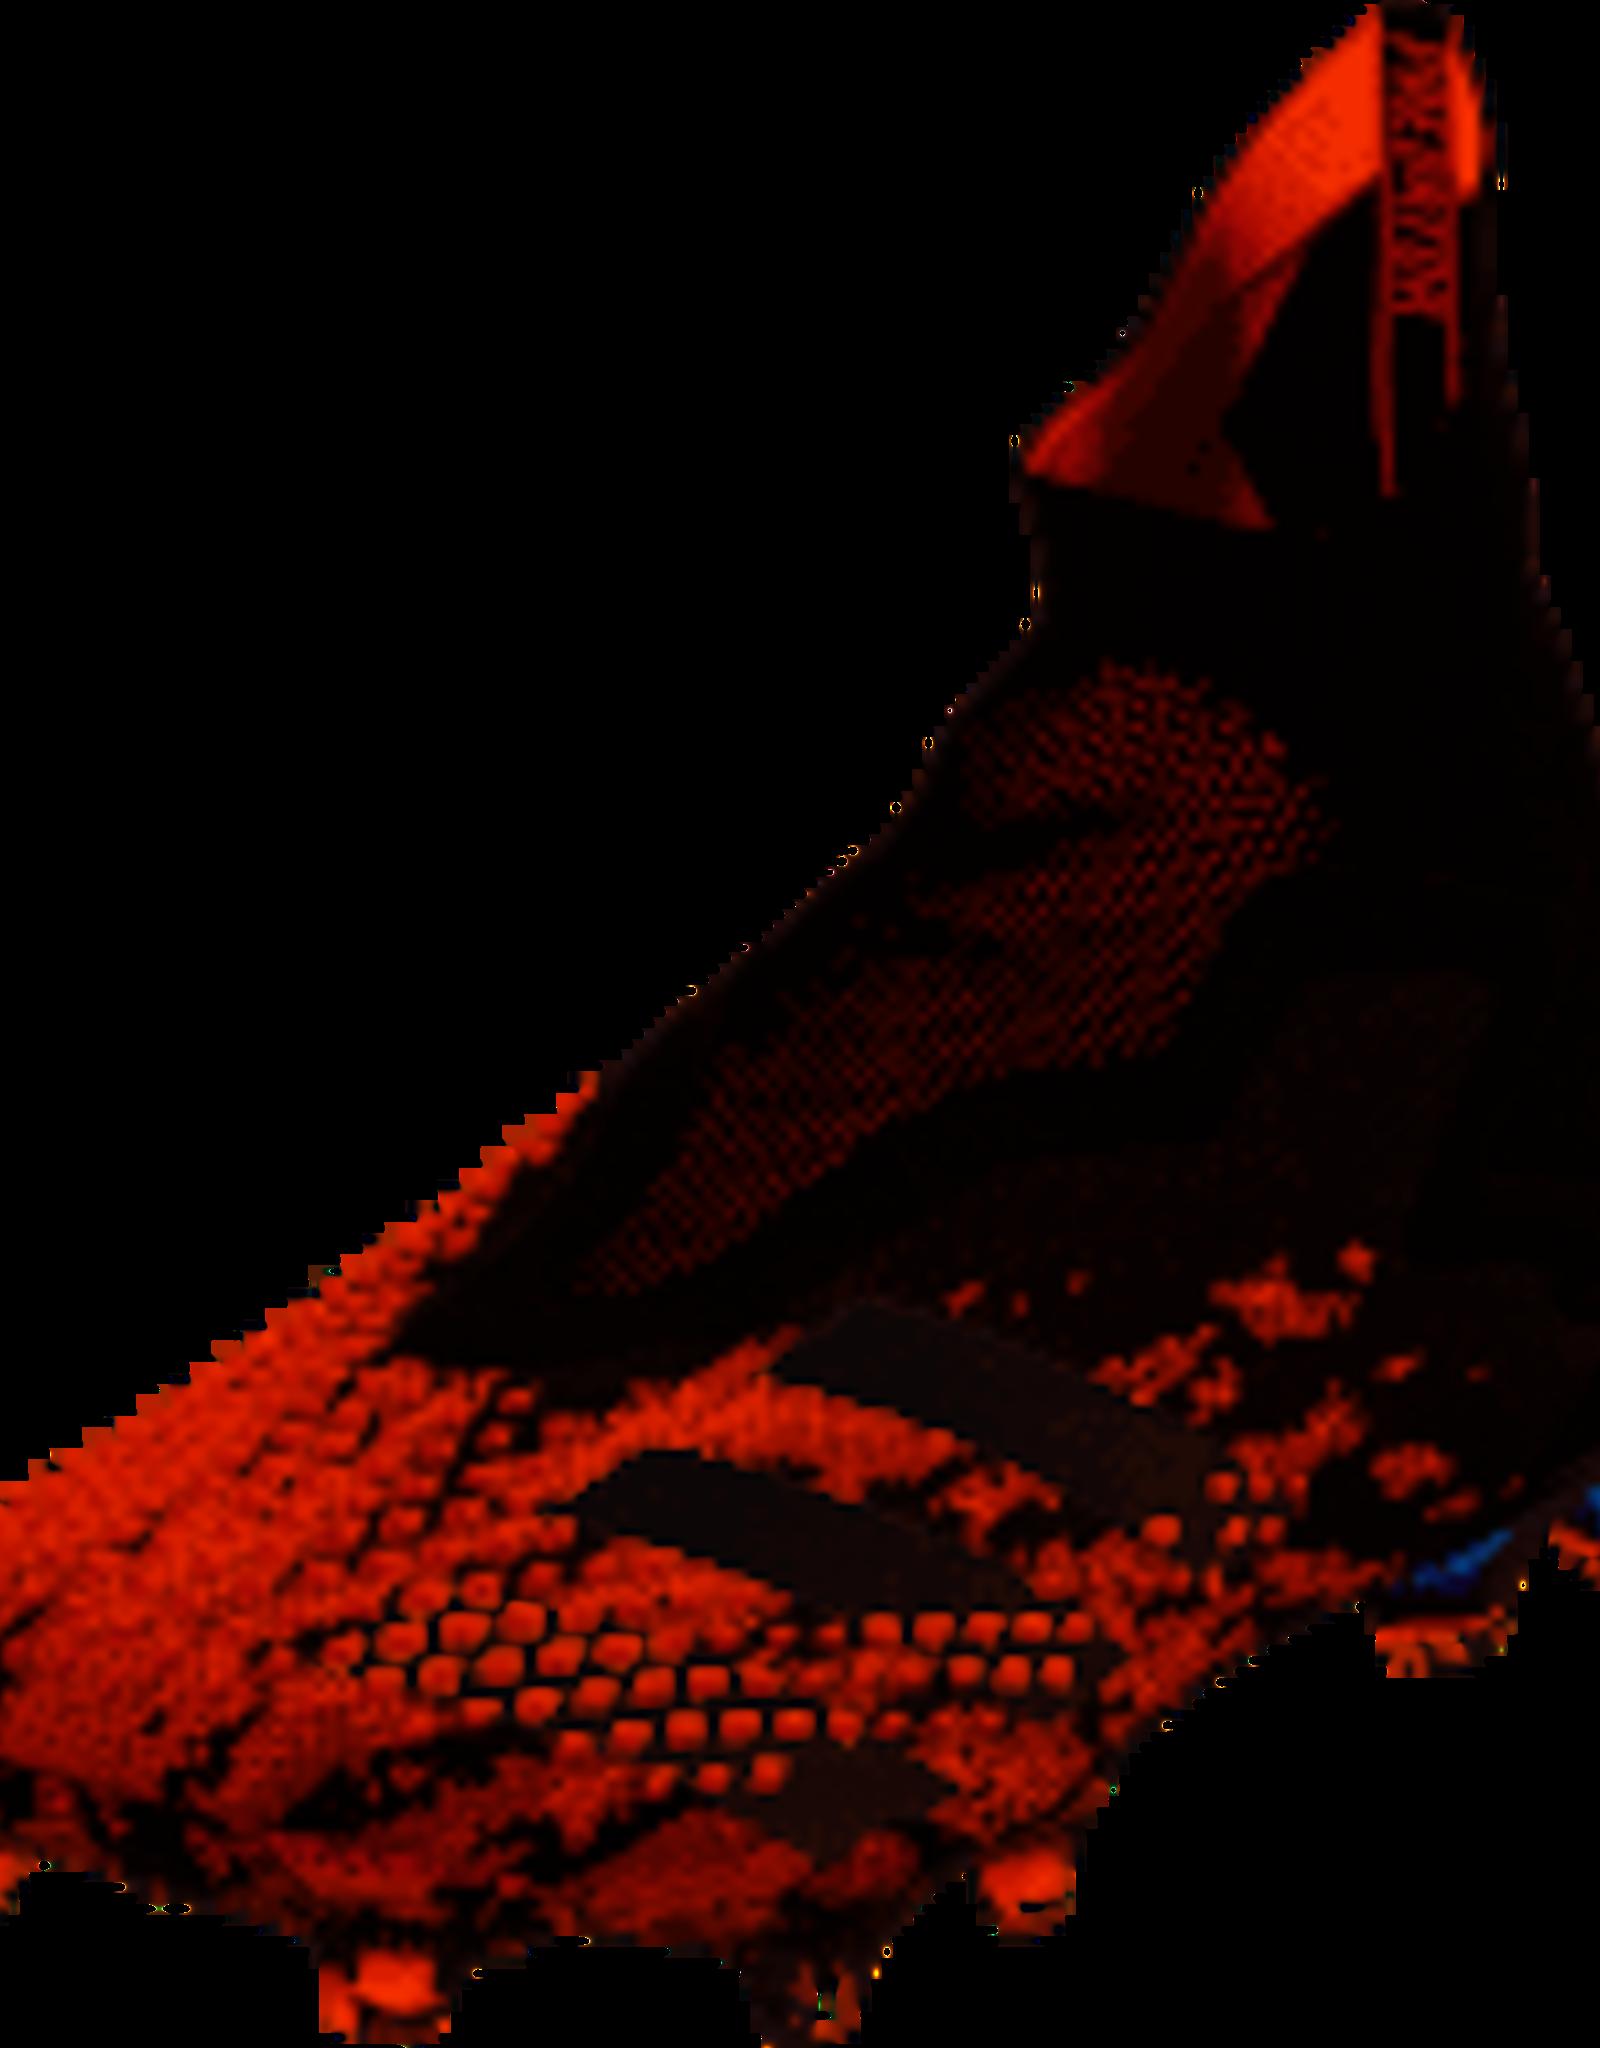 Adidas adidas Predator 20+ FG Firm Ground Soccer Cleat